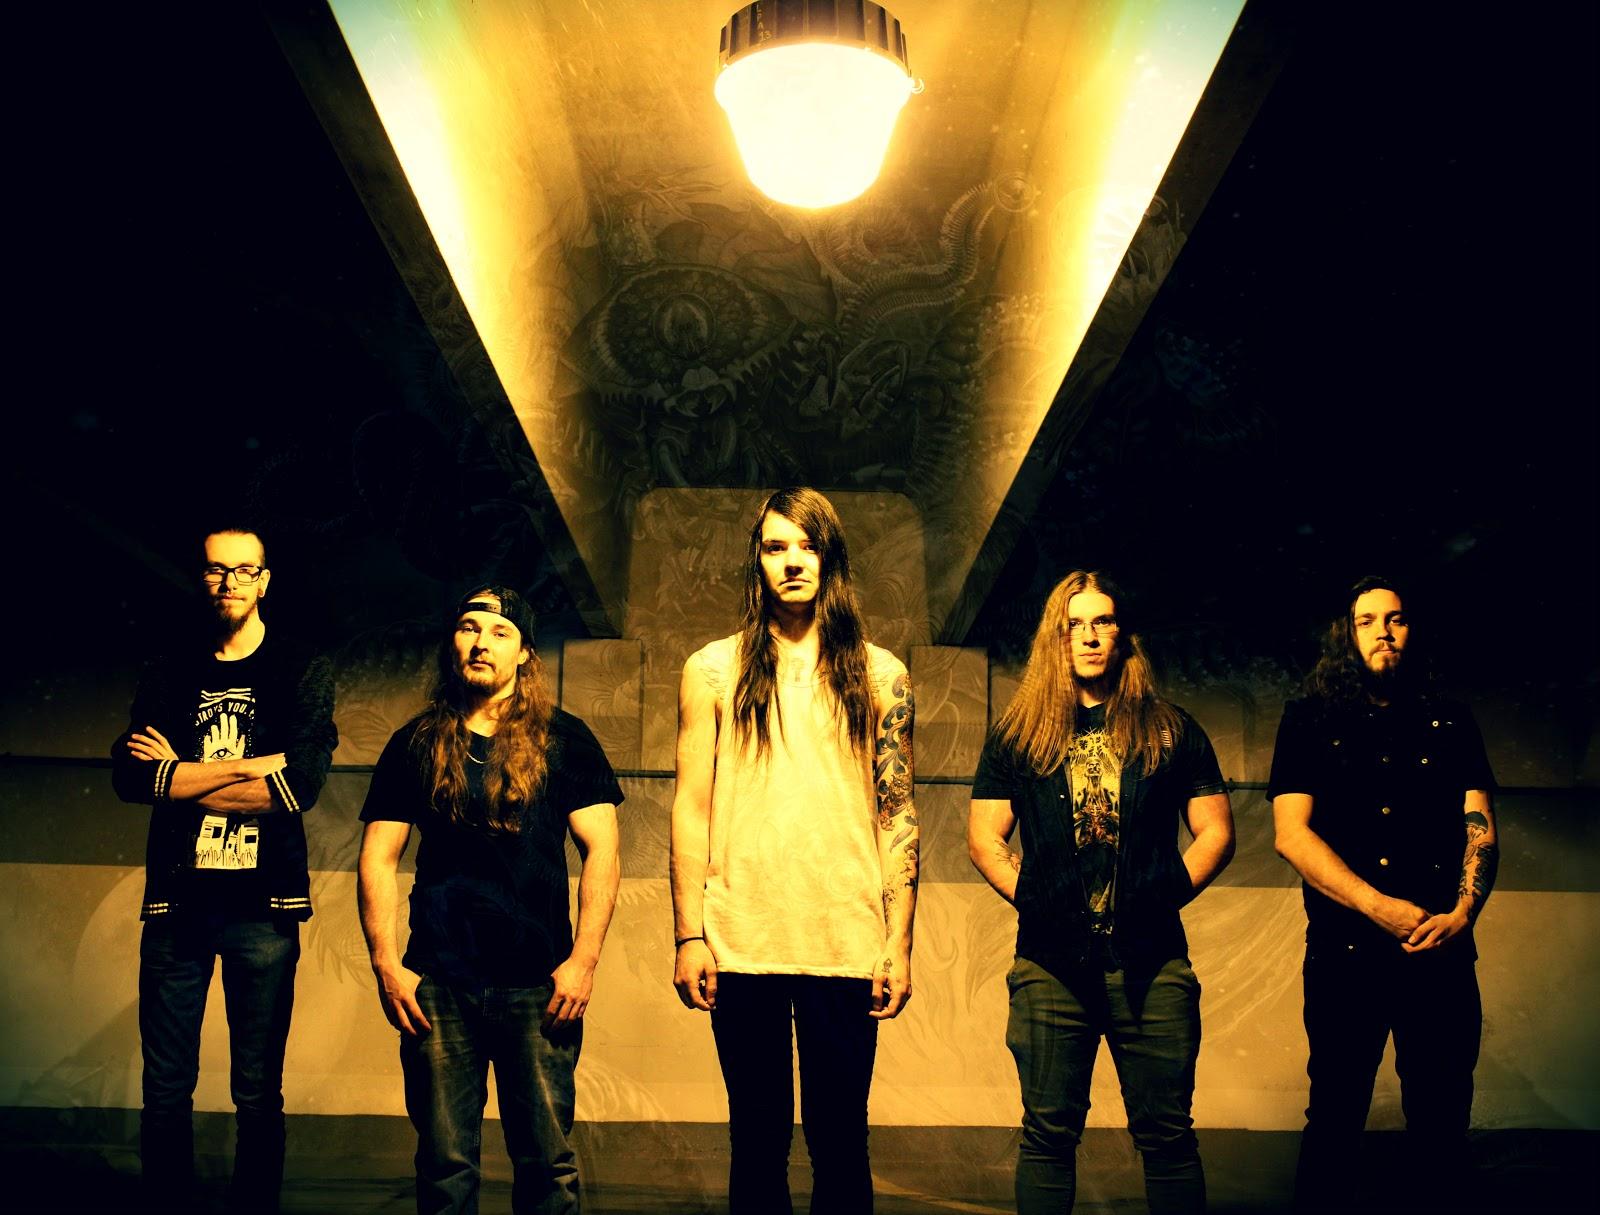 Astral Full Band (With Album Art1).jpg